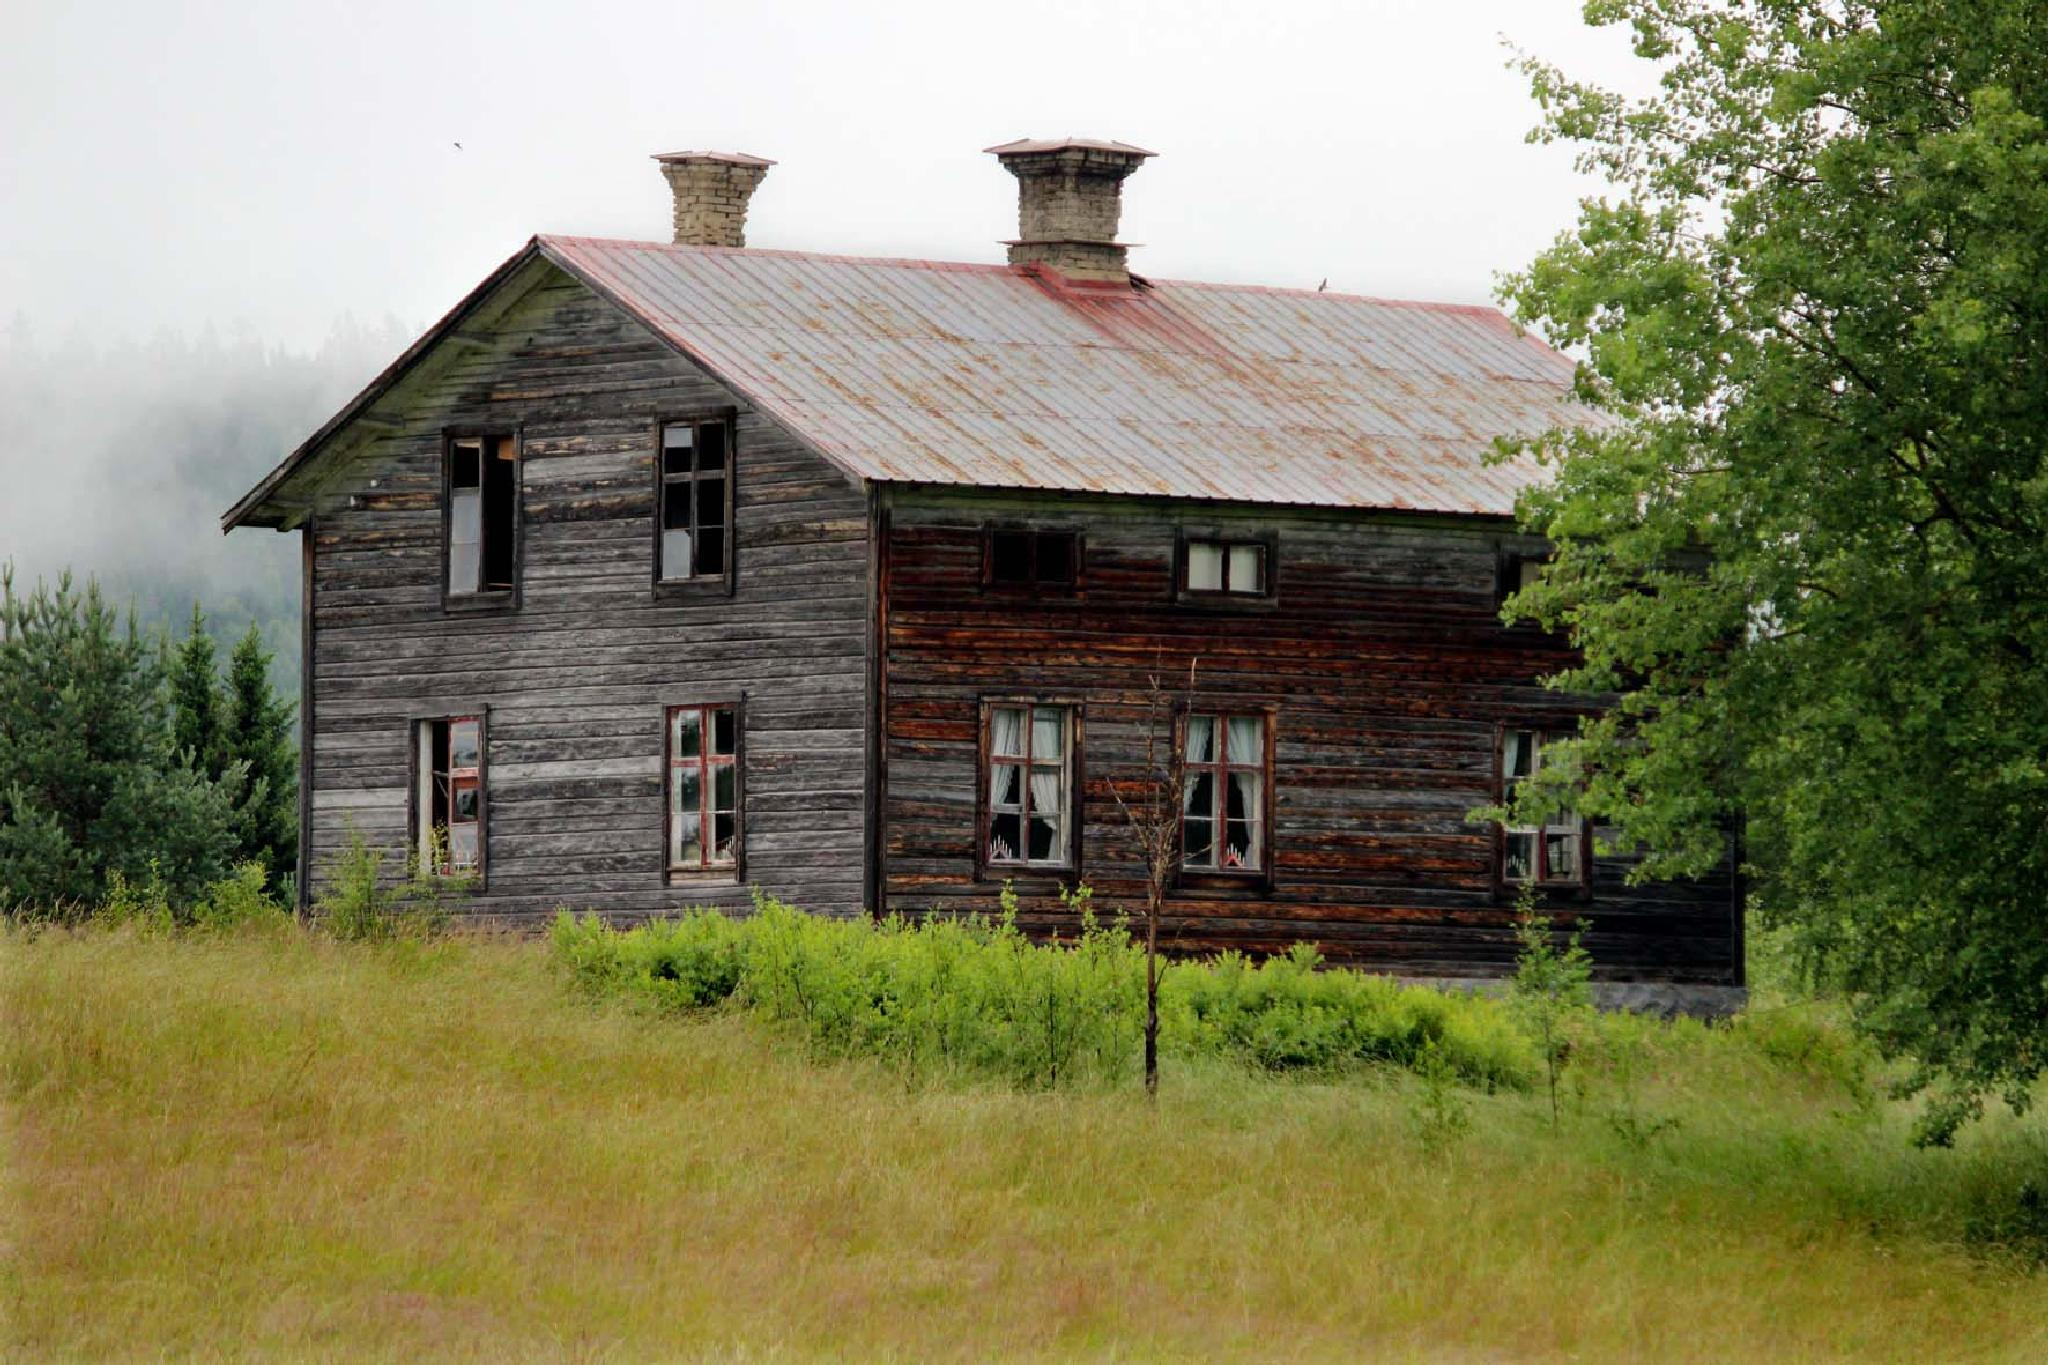 The Old House by Sören Olsson